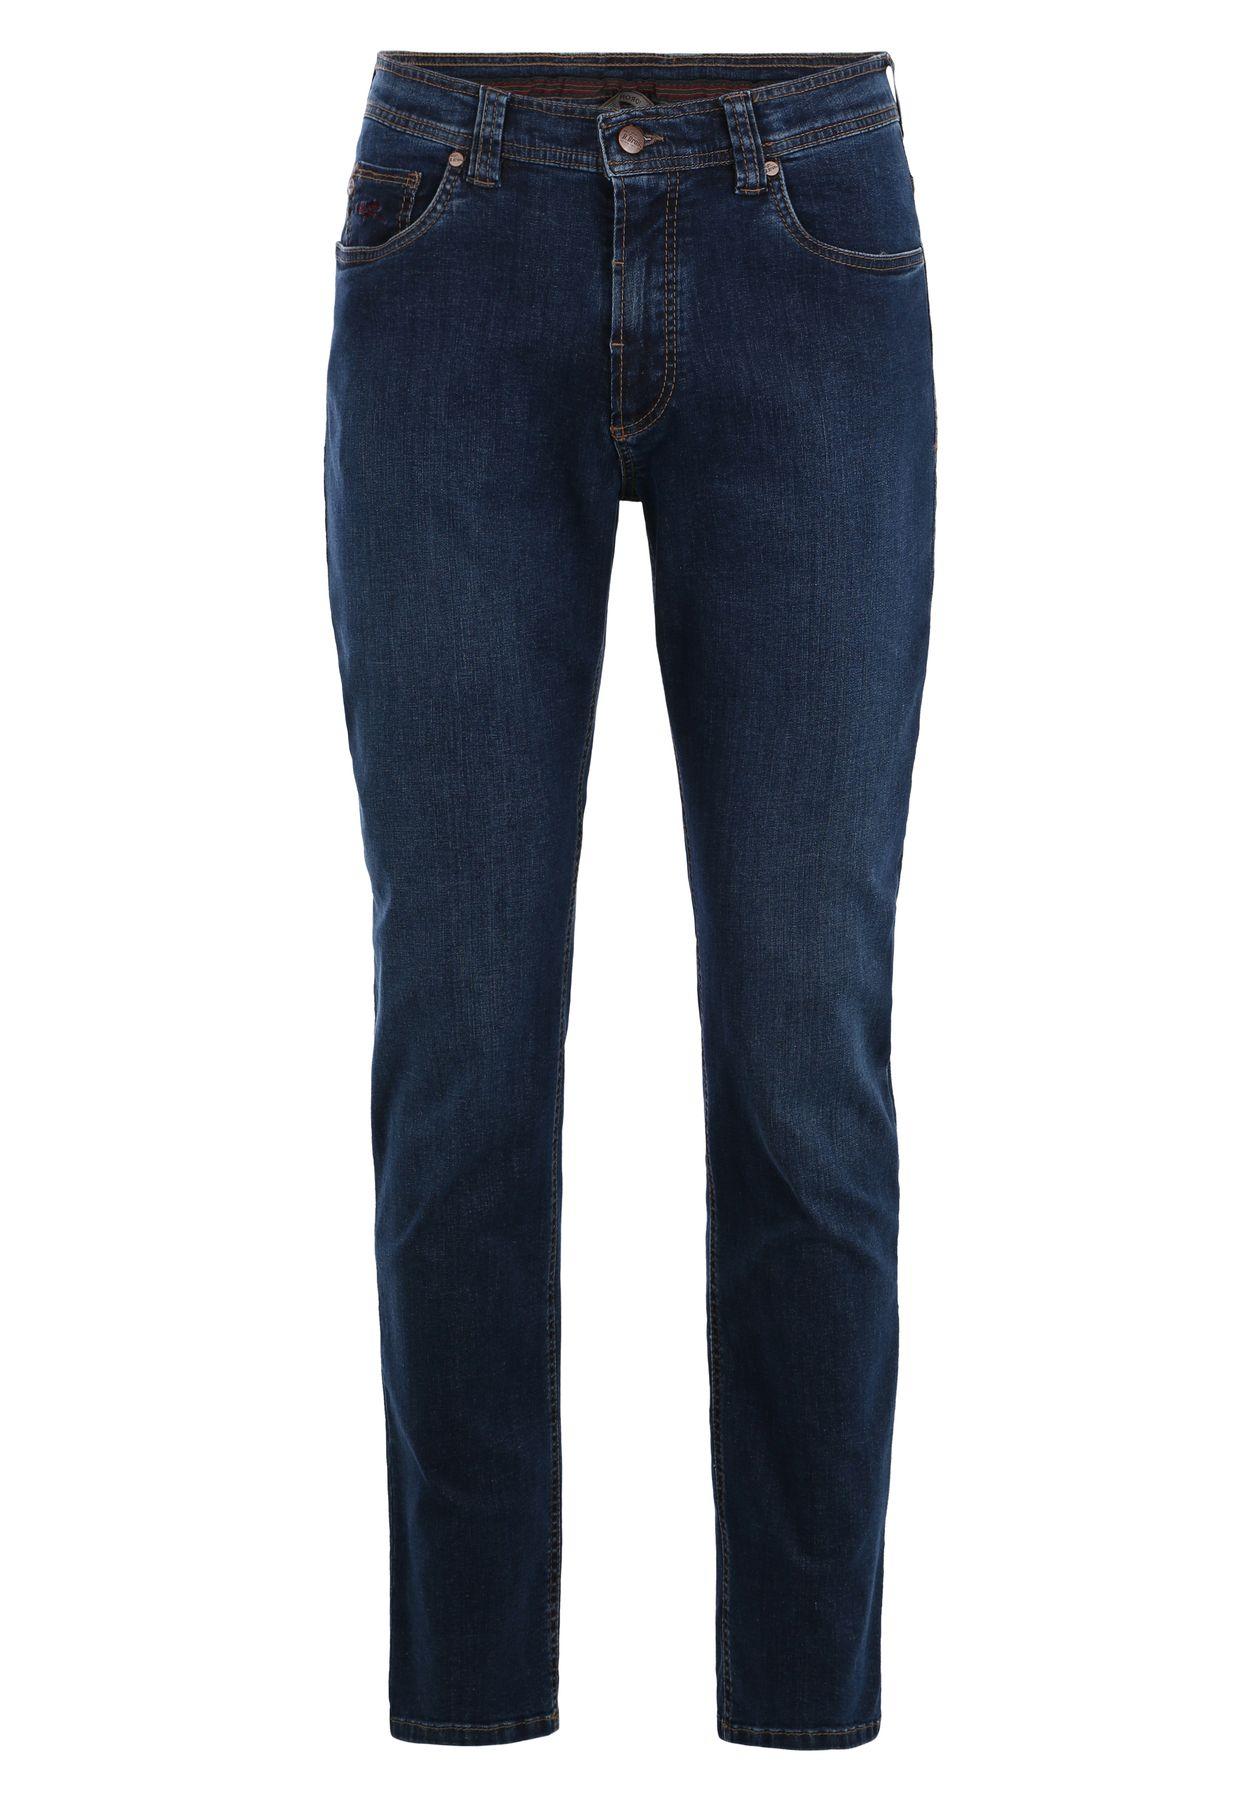 Brühl - Herren 5-Pocket Jeans in verschiedenen Farben, Toronto 2 (0614190991100) – Bild 1